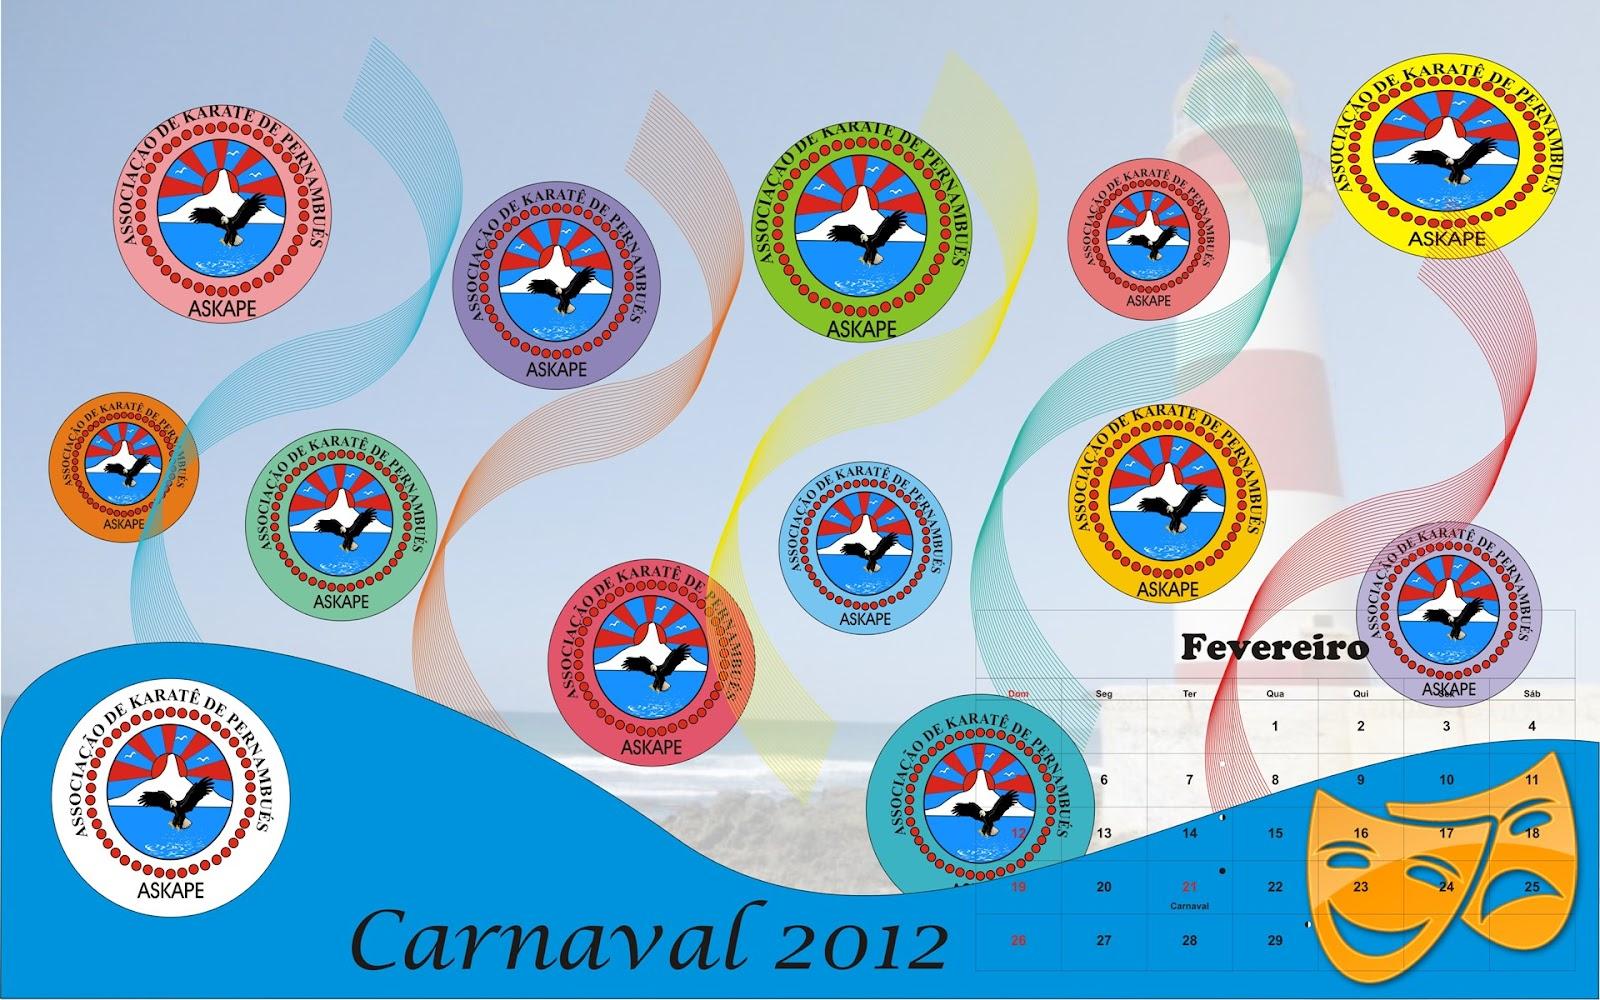 Wallpaper Carnaval Da ASKAPE 2012